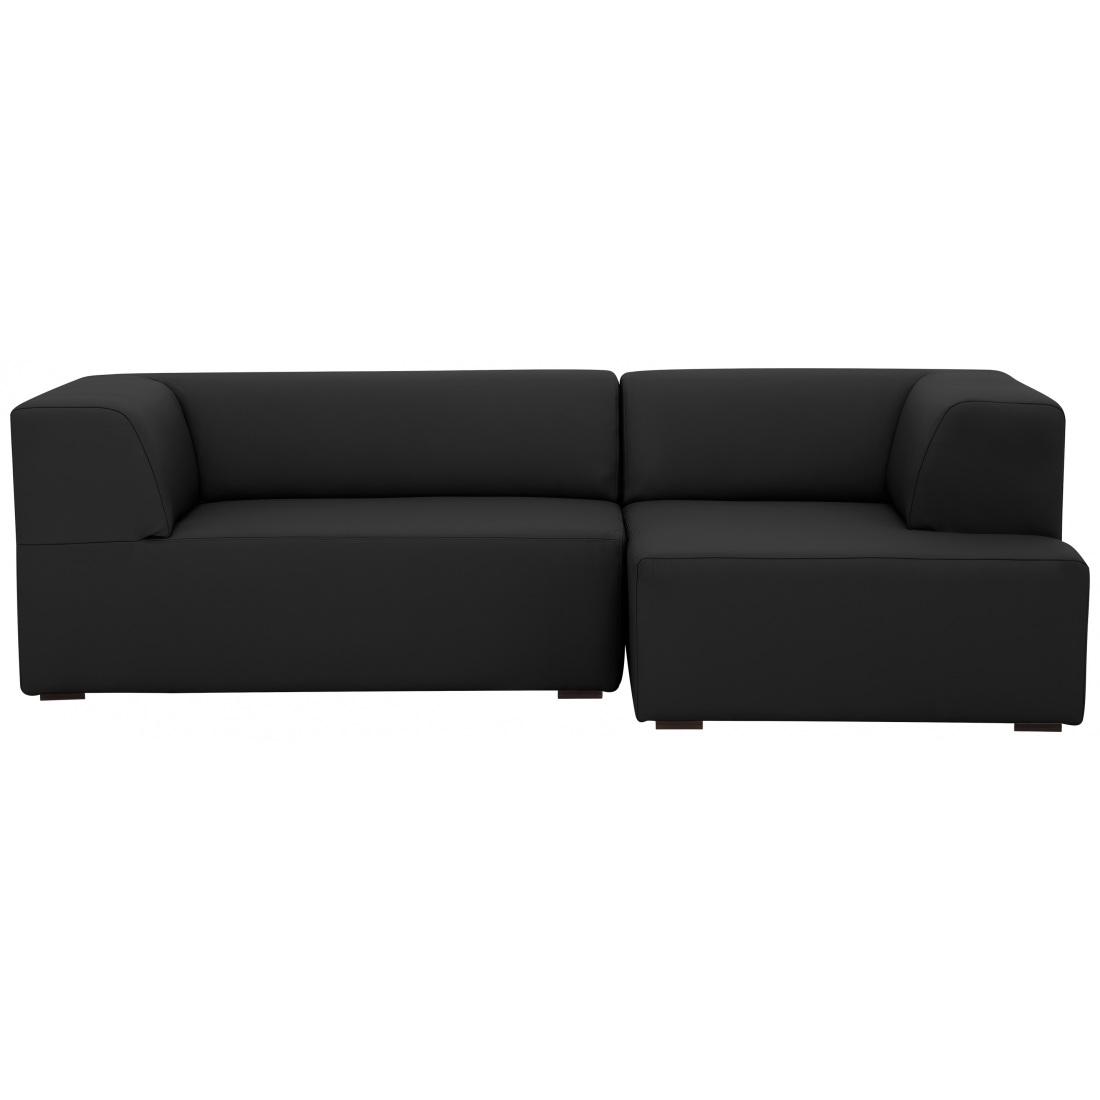 Full Size of Sofa Componibile Dhl Packset Sklum Dhel Modular Review Dwell Modulares Set Fleleder Lennon Ikea Mit Elektrischer Sitztiefenverstellung 3 Sitzer Grau Wohnzimmer Sofa Dhel